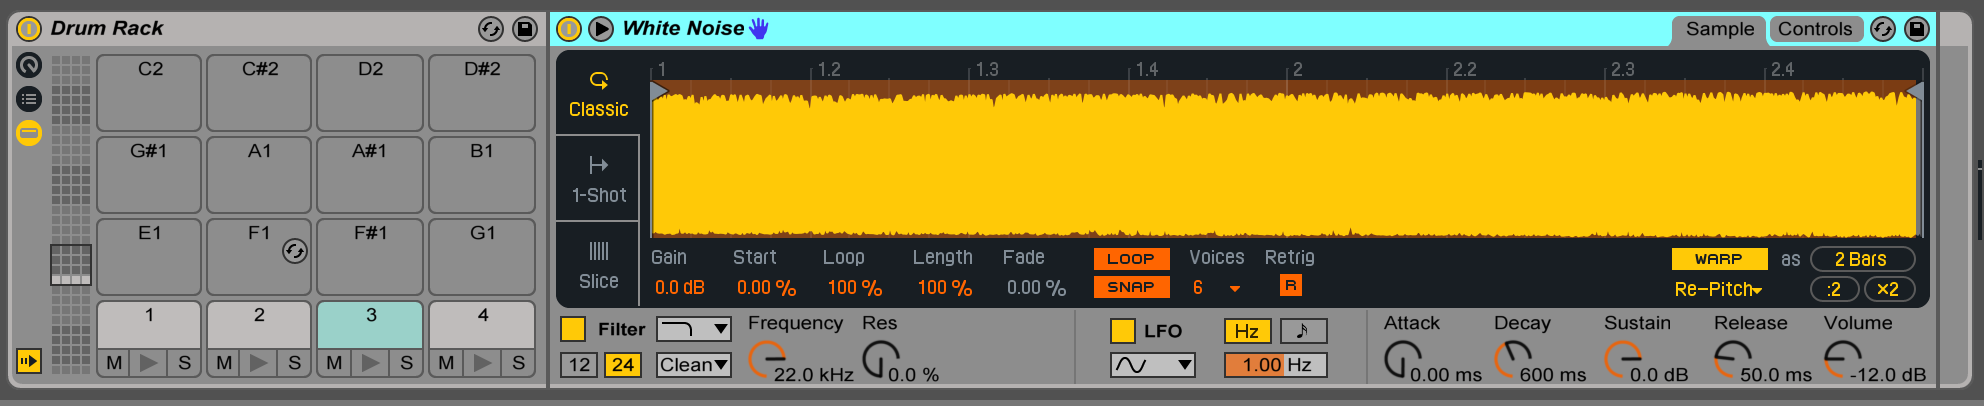 Drum rack noise triggers